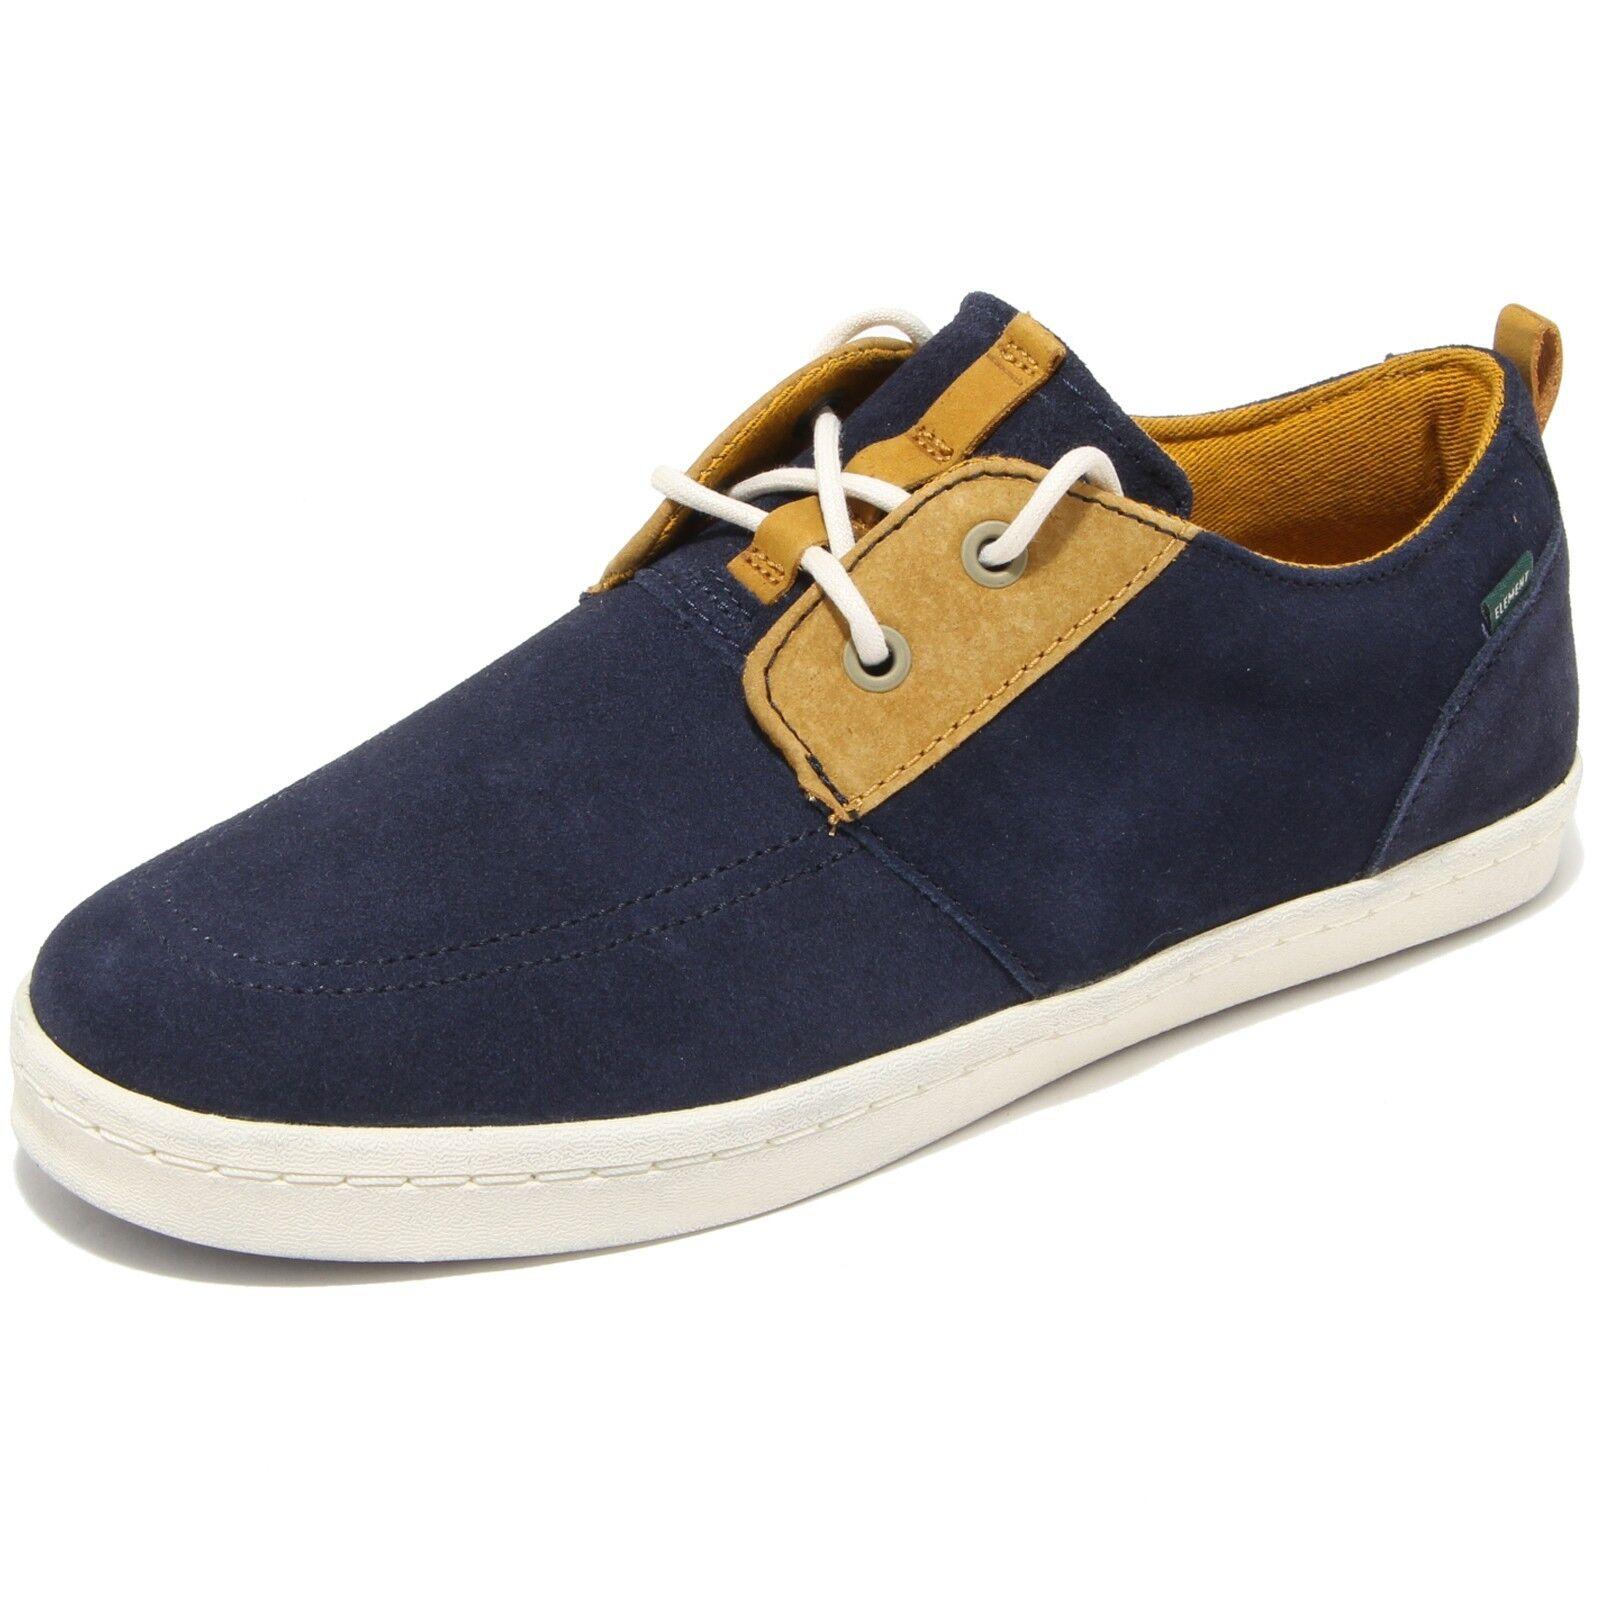 8854I ELEMENT emerald collection scarpe uomo sneakers shoes men blu